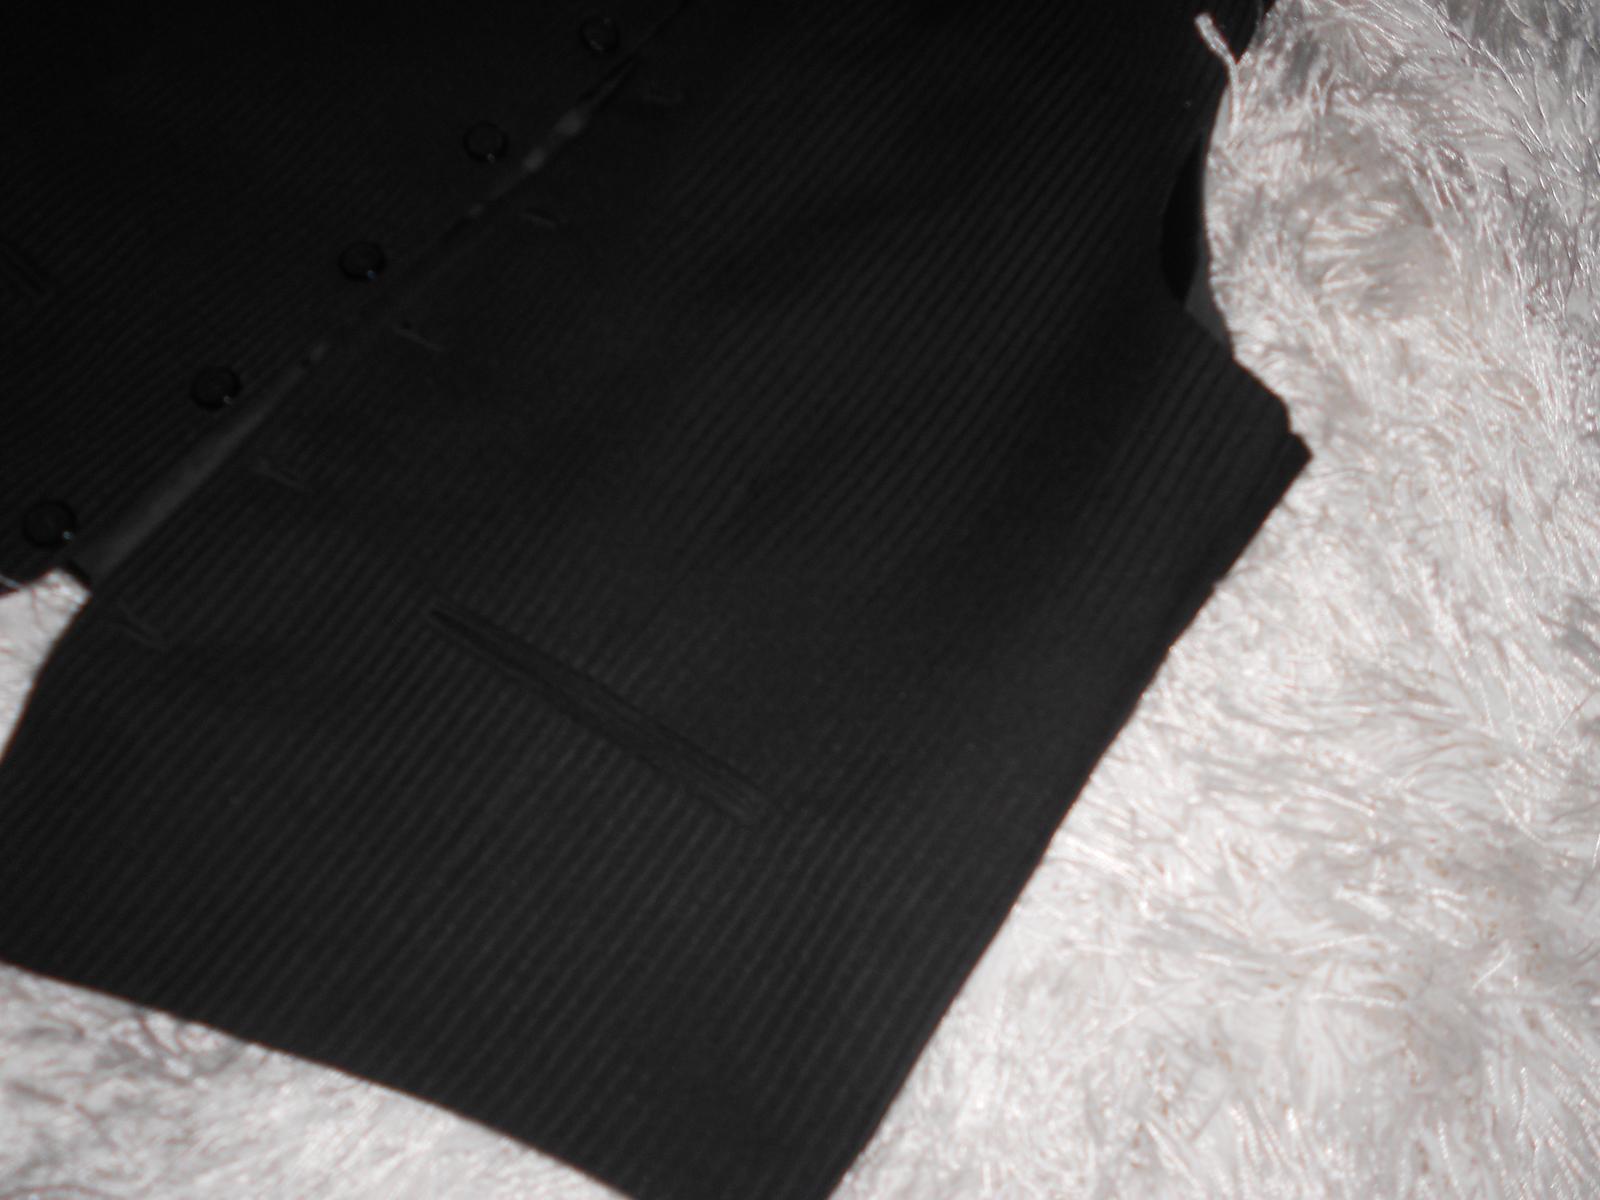 Oblek čierny + 2ks košele a kravaty gratis - Obrázok č. 4